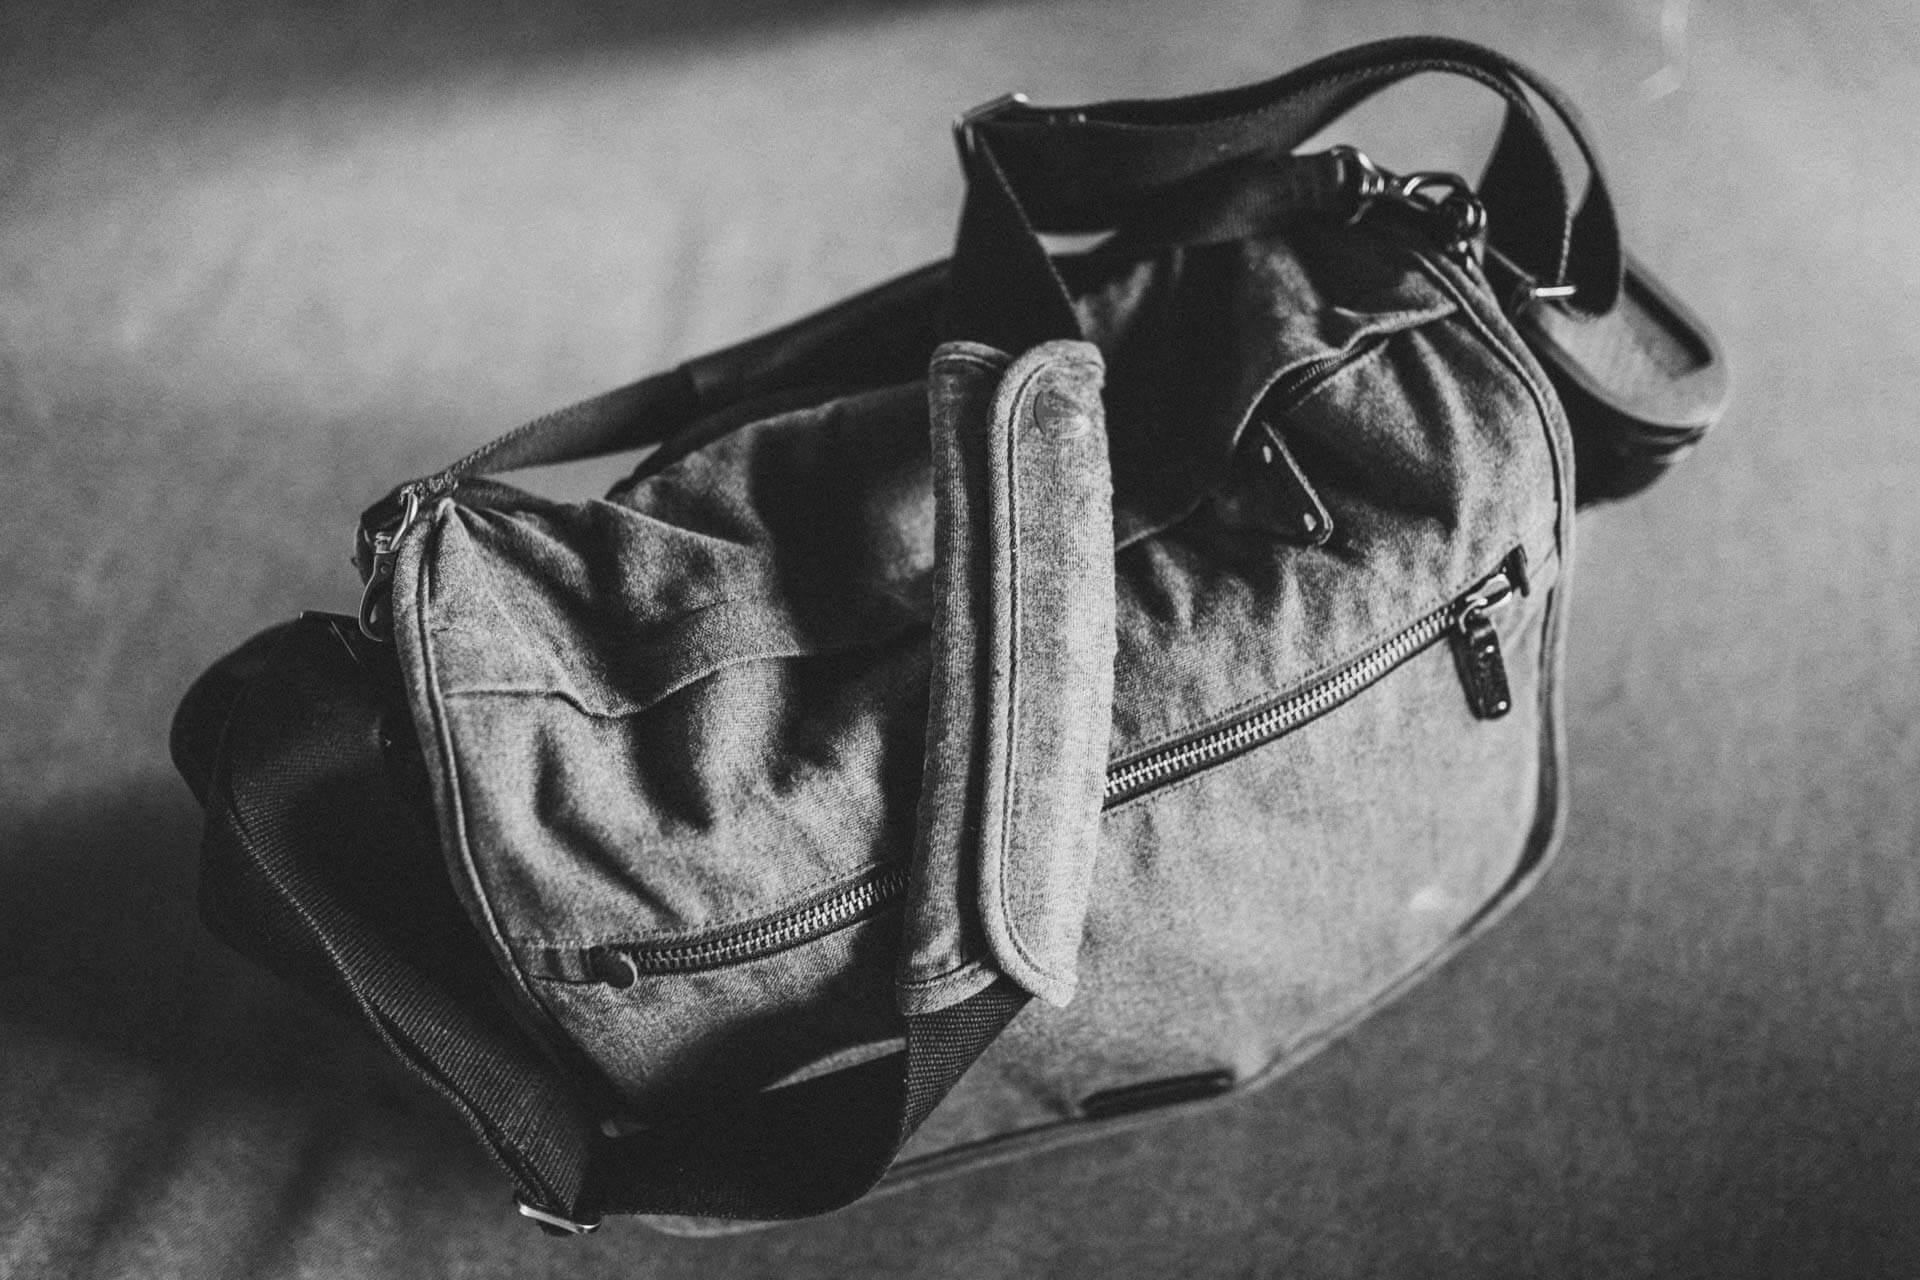 meine heissgeliebte tenba-fototasche - was ist in meiner fototasche, what´s in my bag